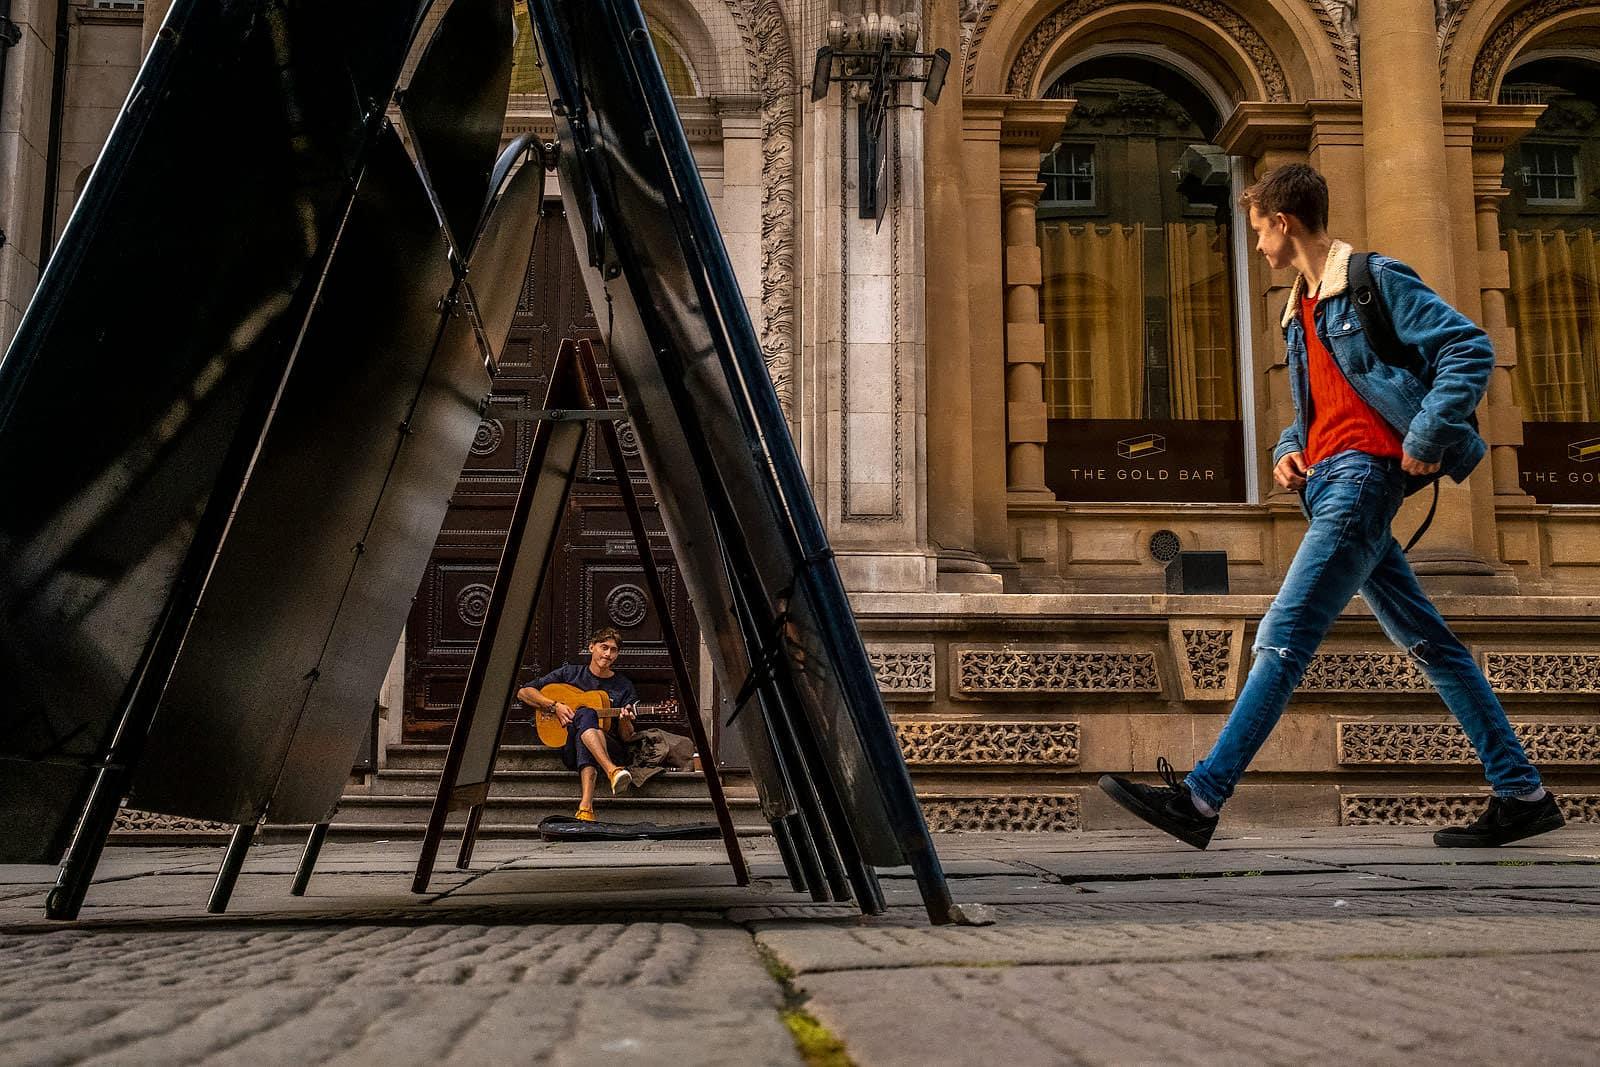 London Street Photographer